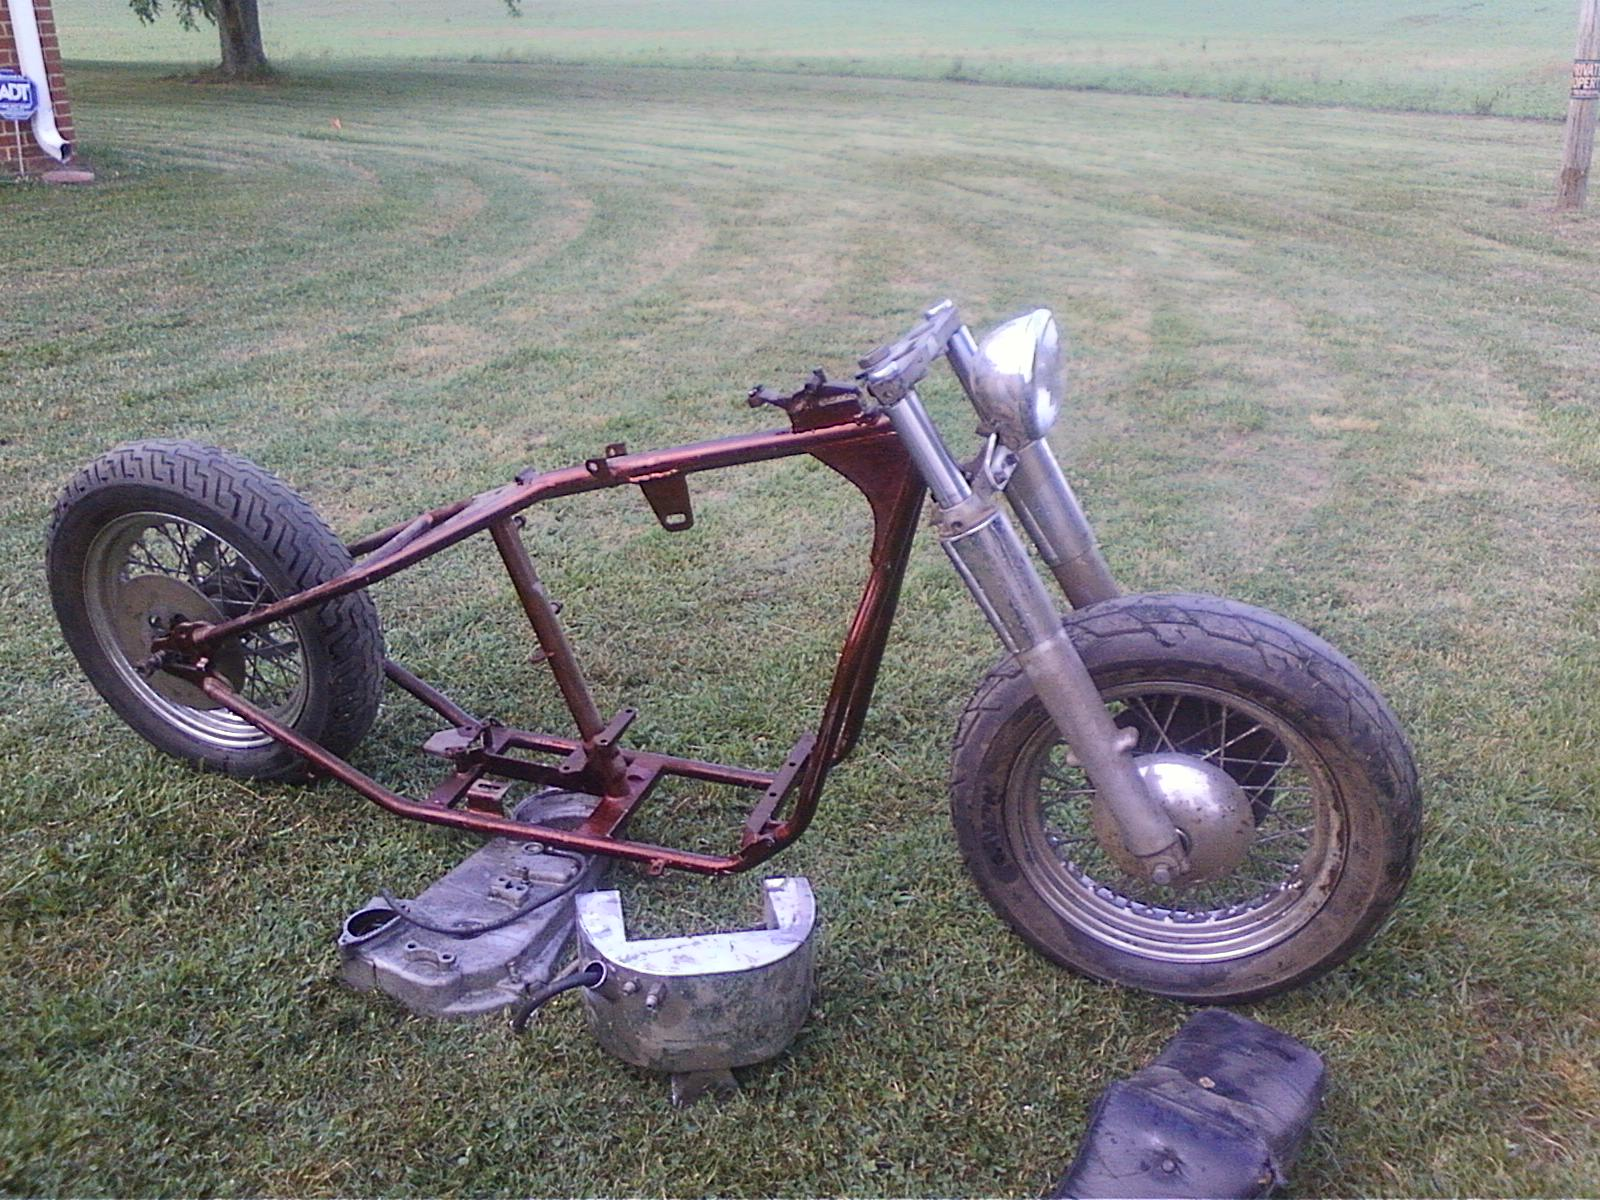 Making It On Used Harley Bones: rigid roller, wishbone frame, $1200 ...